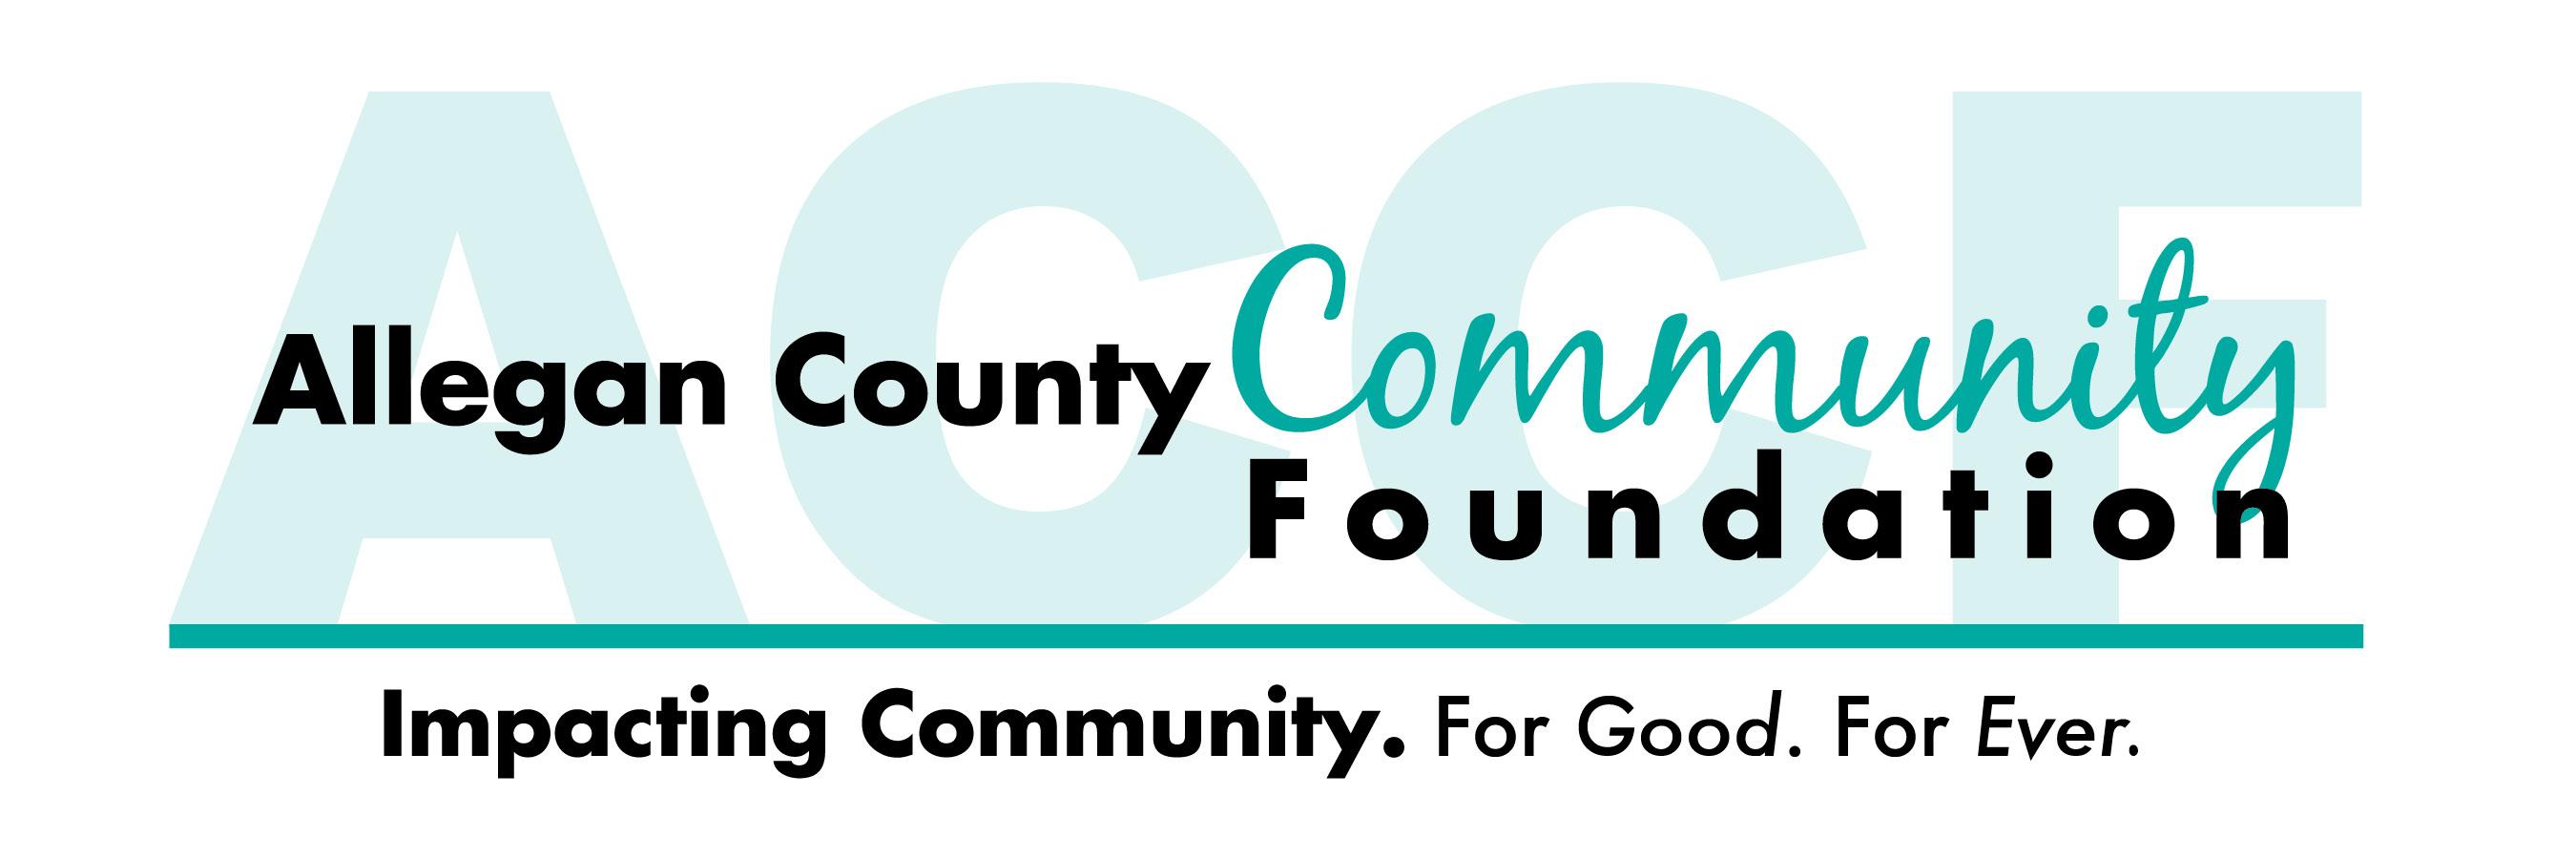 Allegan County Community Foundation Logo